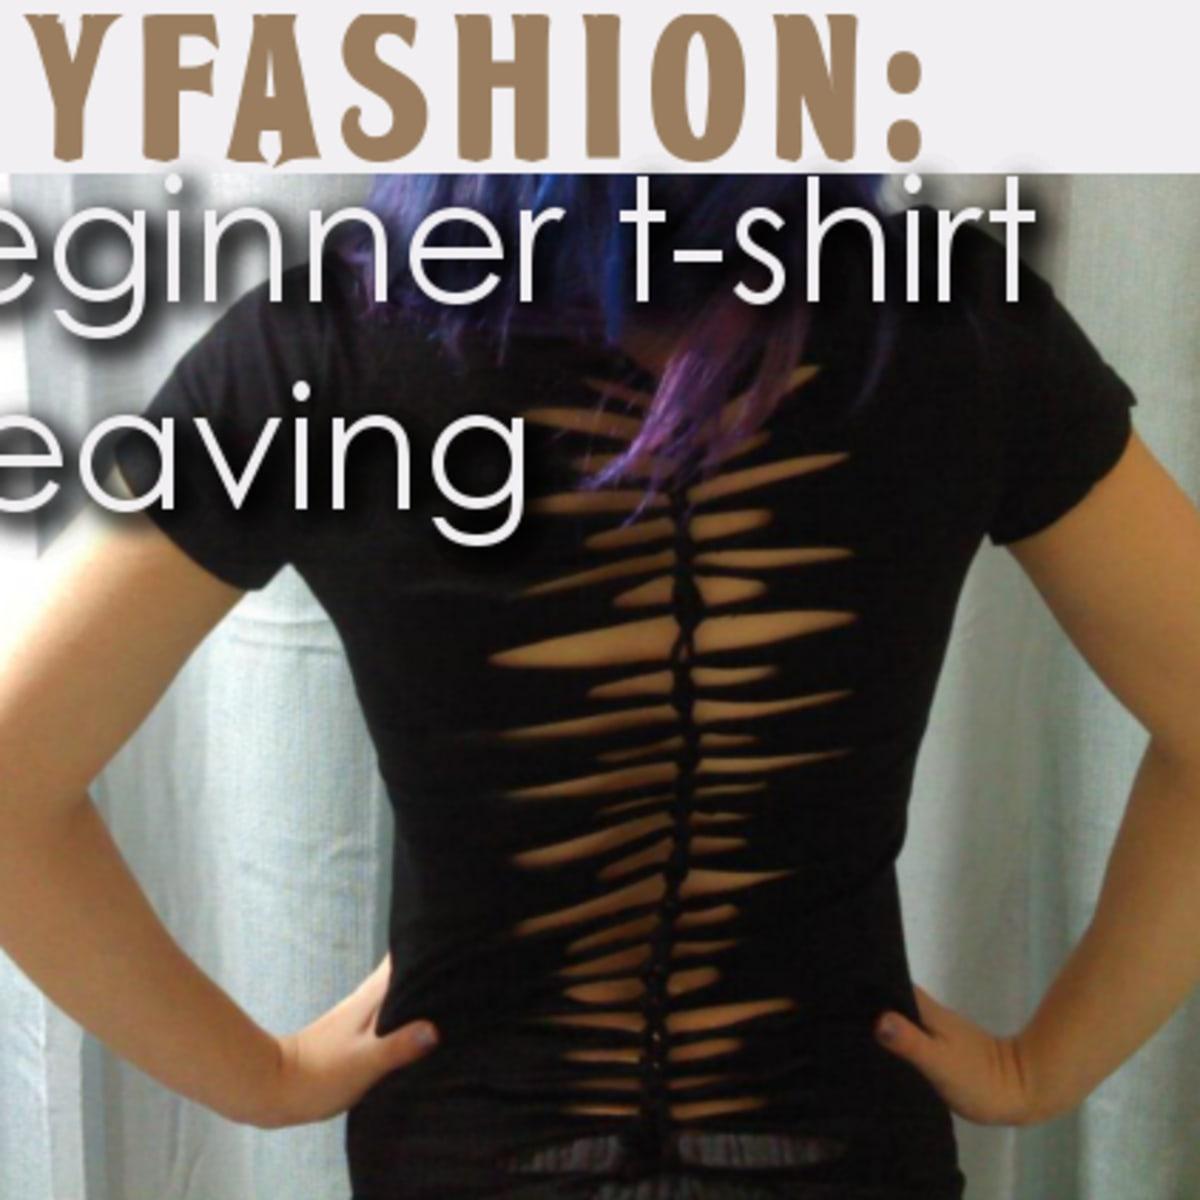 Diy Fashion Beginner T Shirt Weaving Bellatory Fashion And Beauty